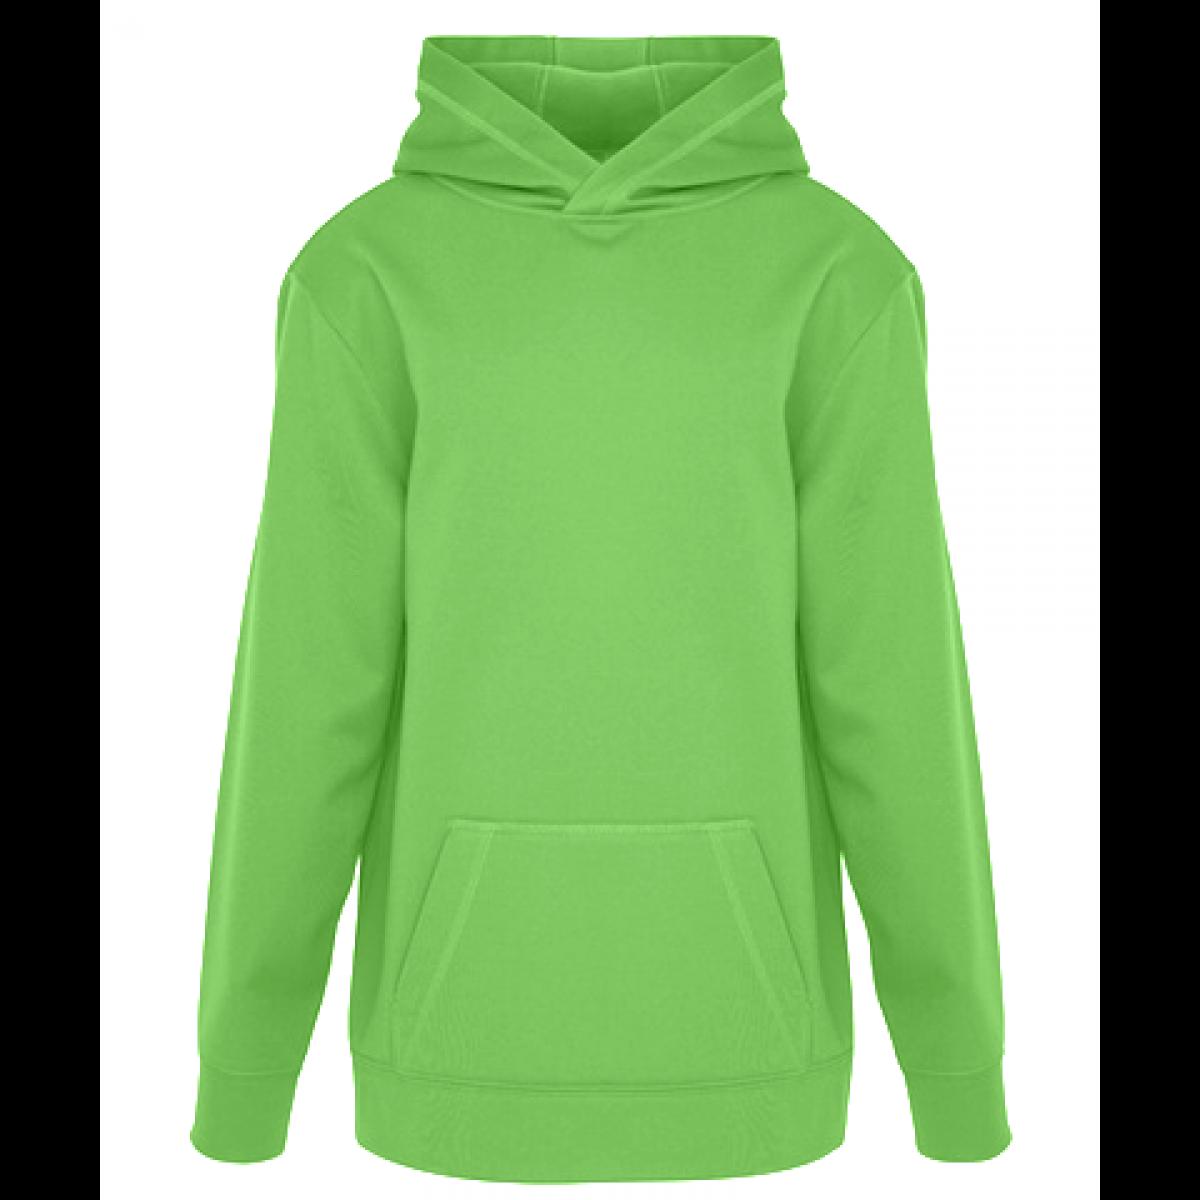 Game Day Fleece Hooded Ladies Sweatshirt-Lime Green-S